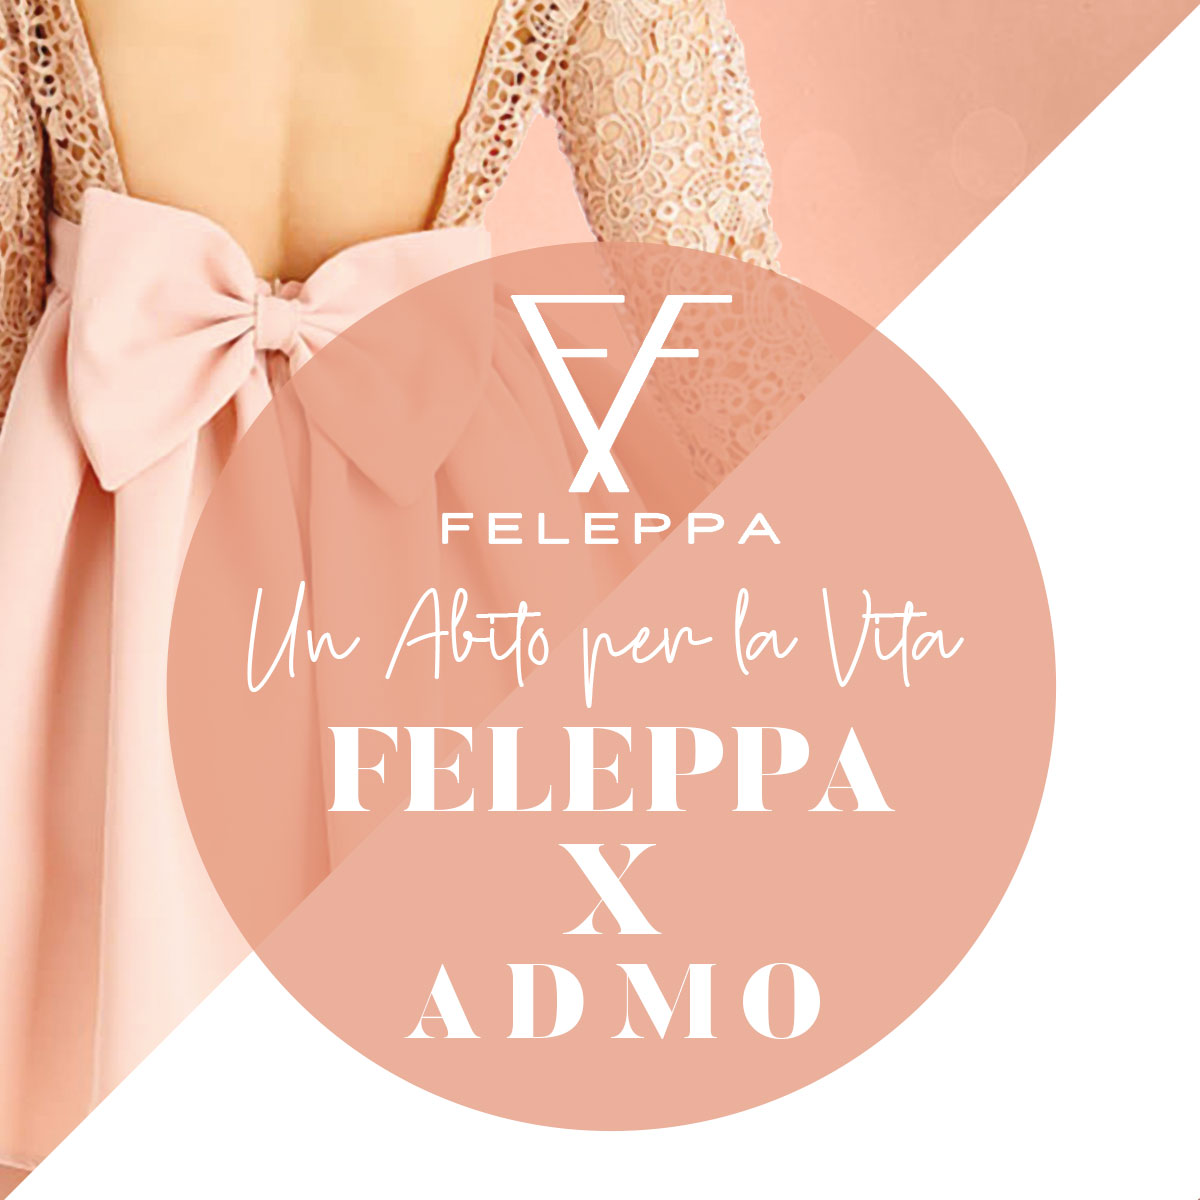 """Feleppa per Admo"""